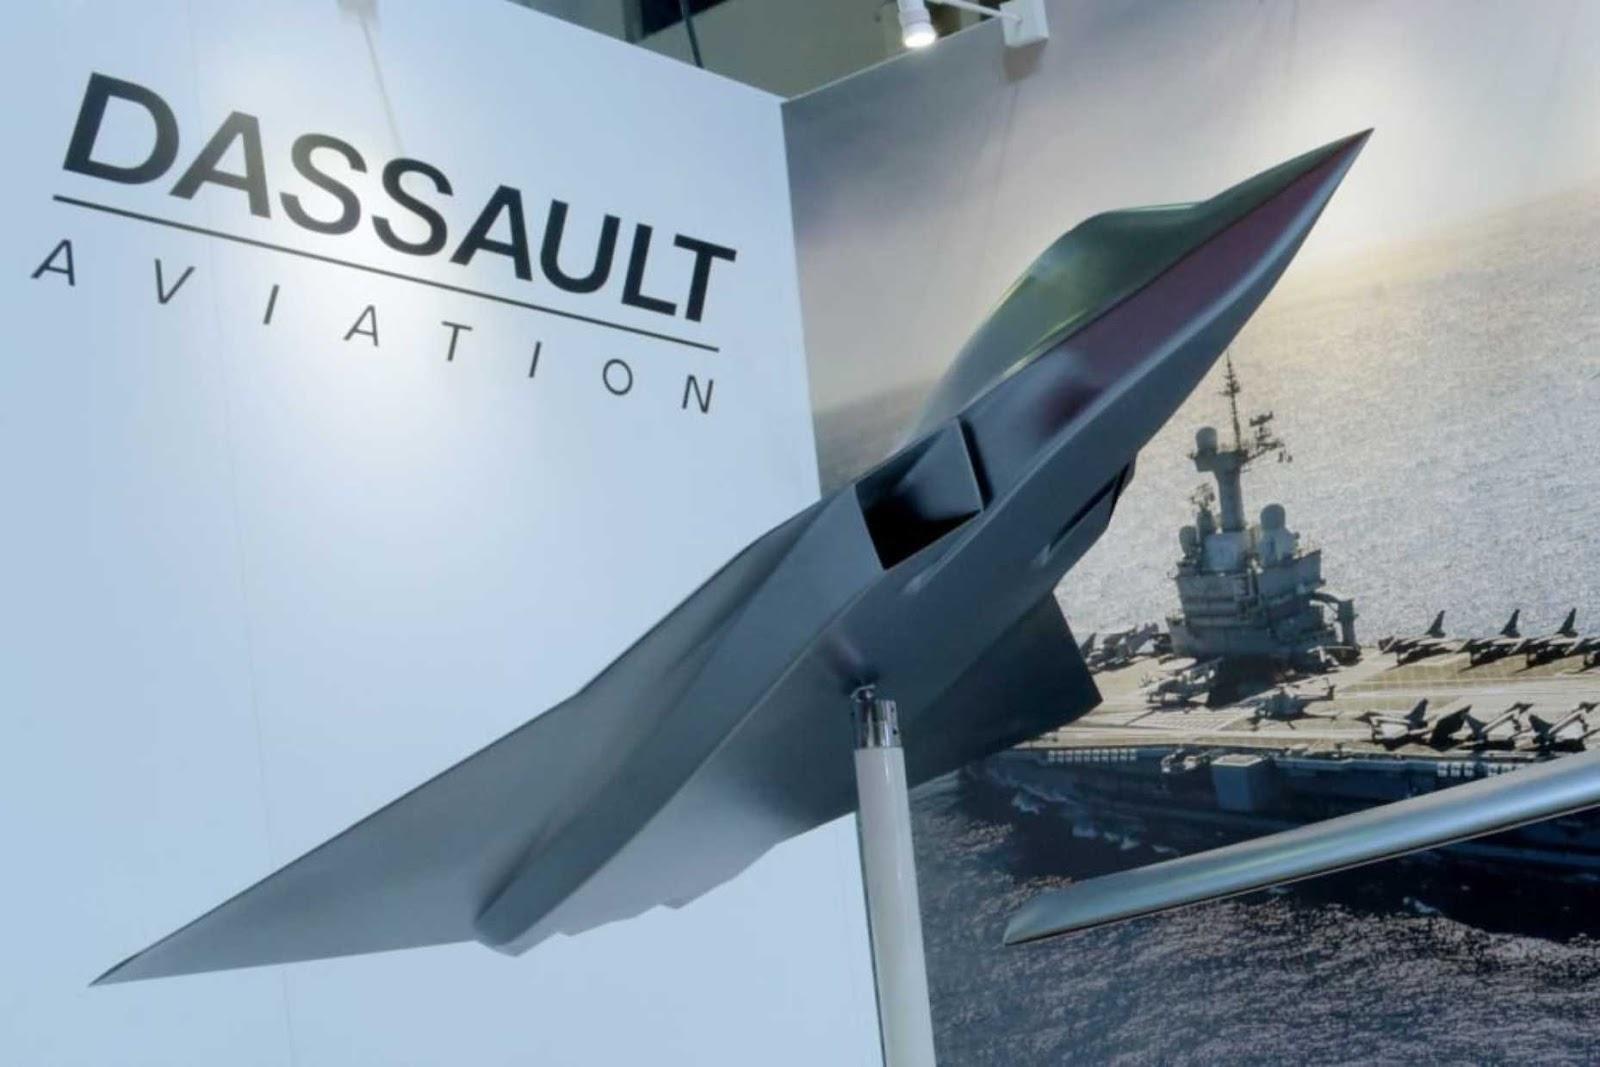 Perancis menunjukkan model pesawat tempur generasi baru